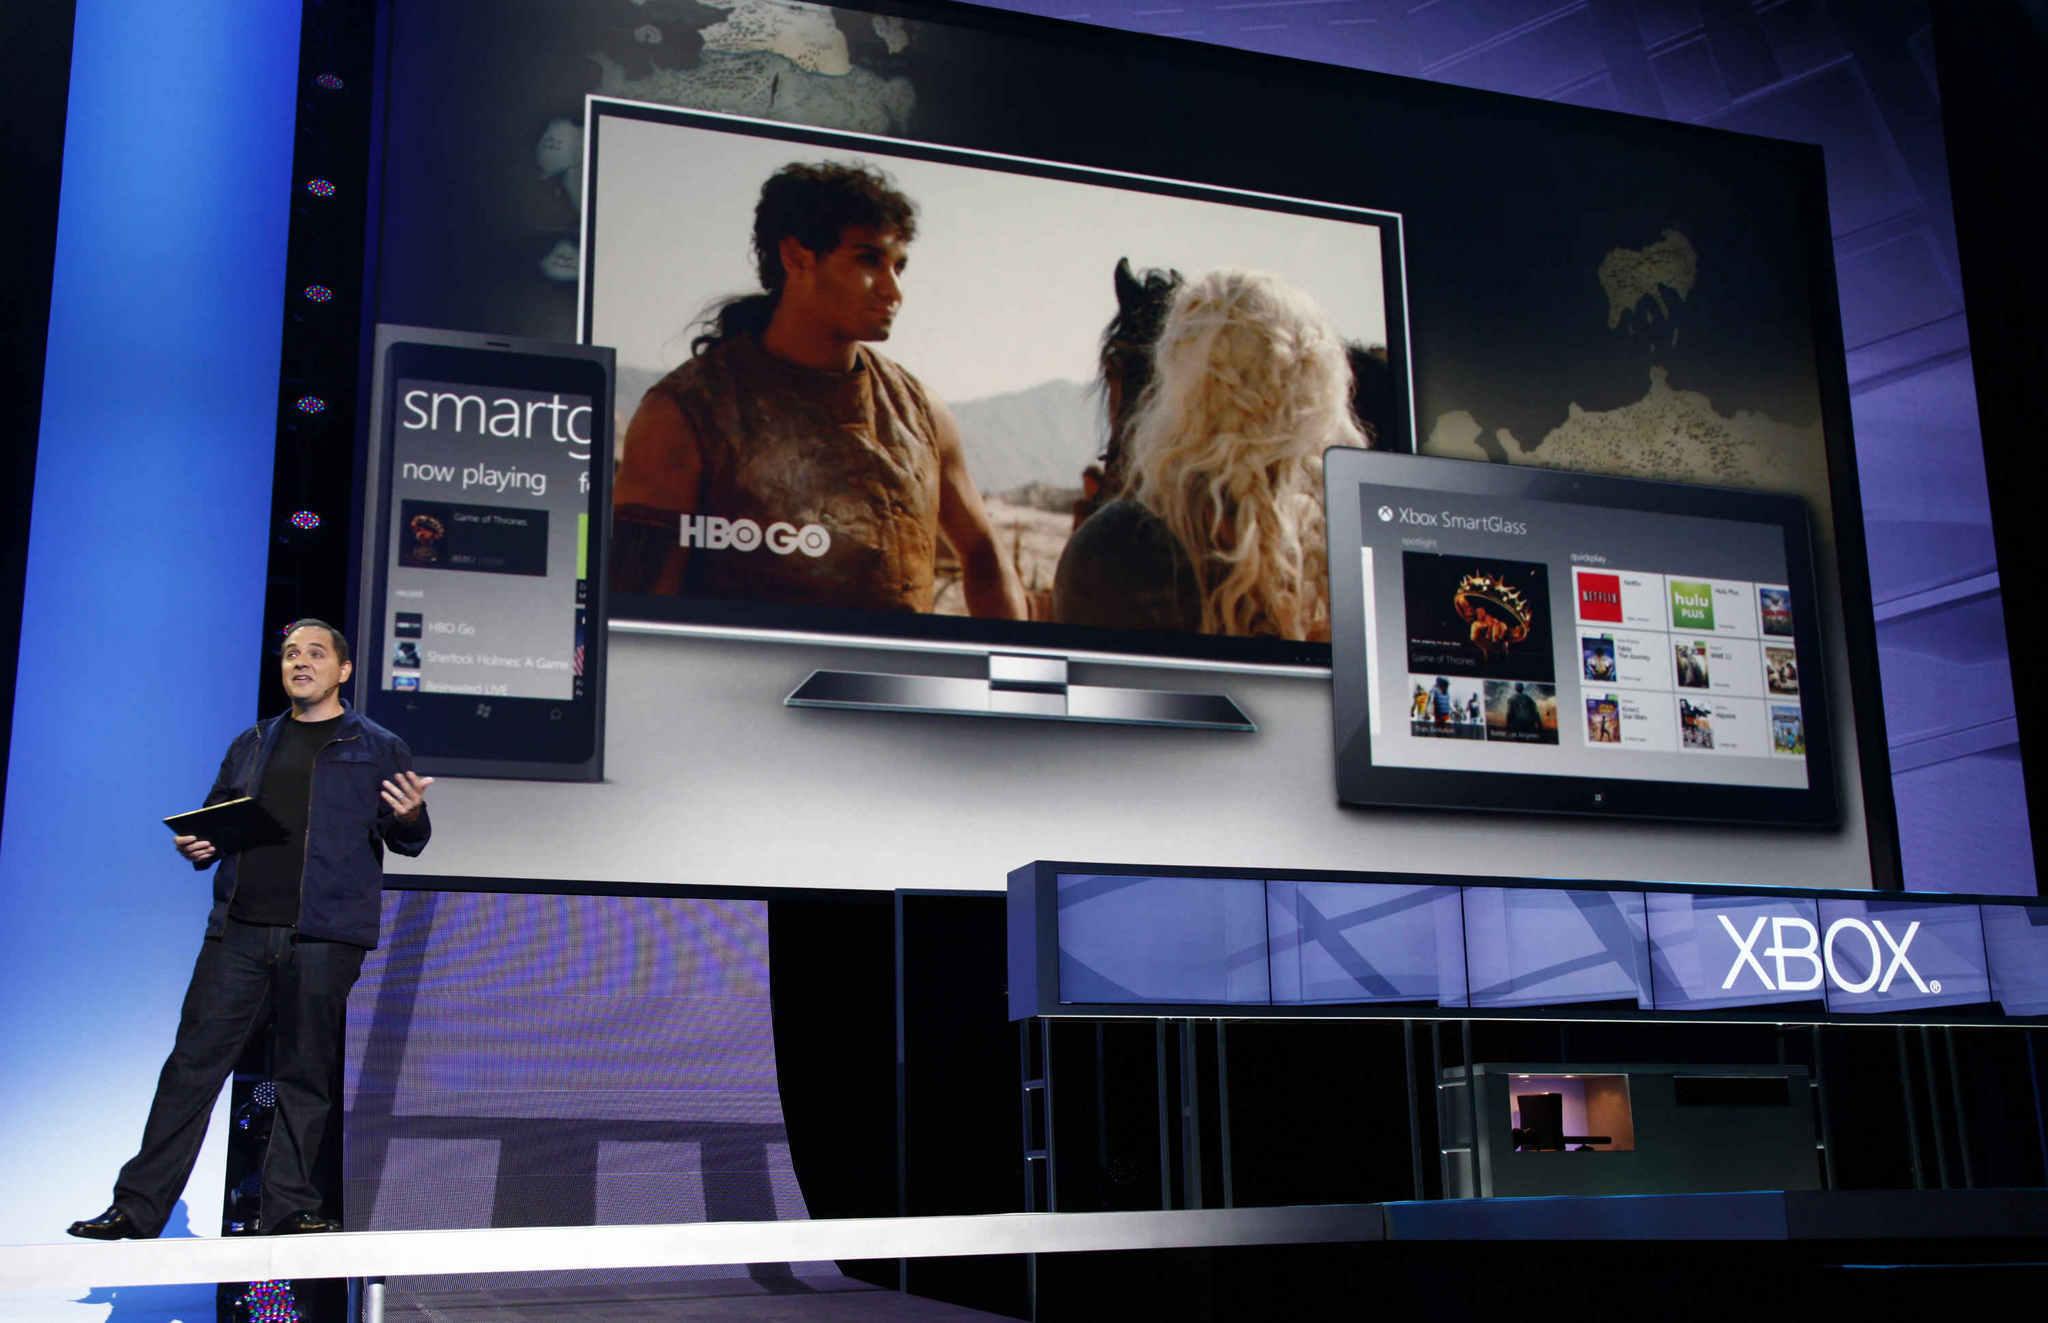 Smartglass for Xbox 360 presented at E3 2012